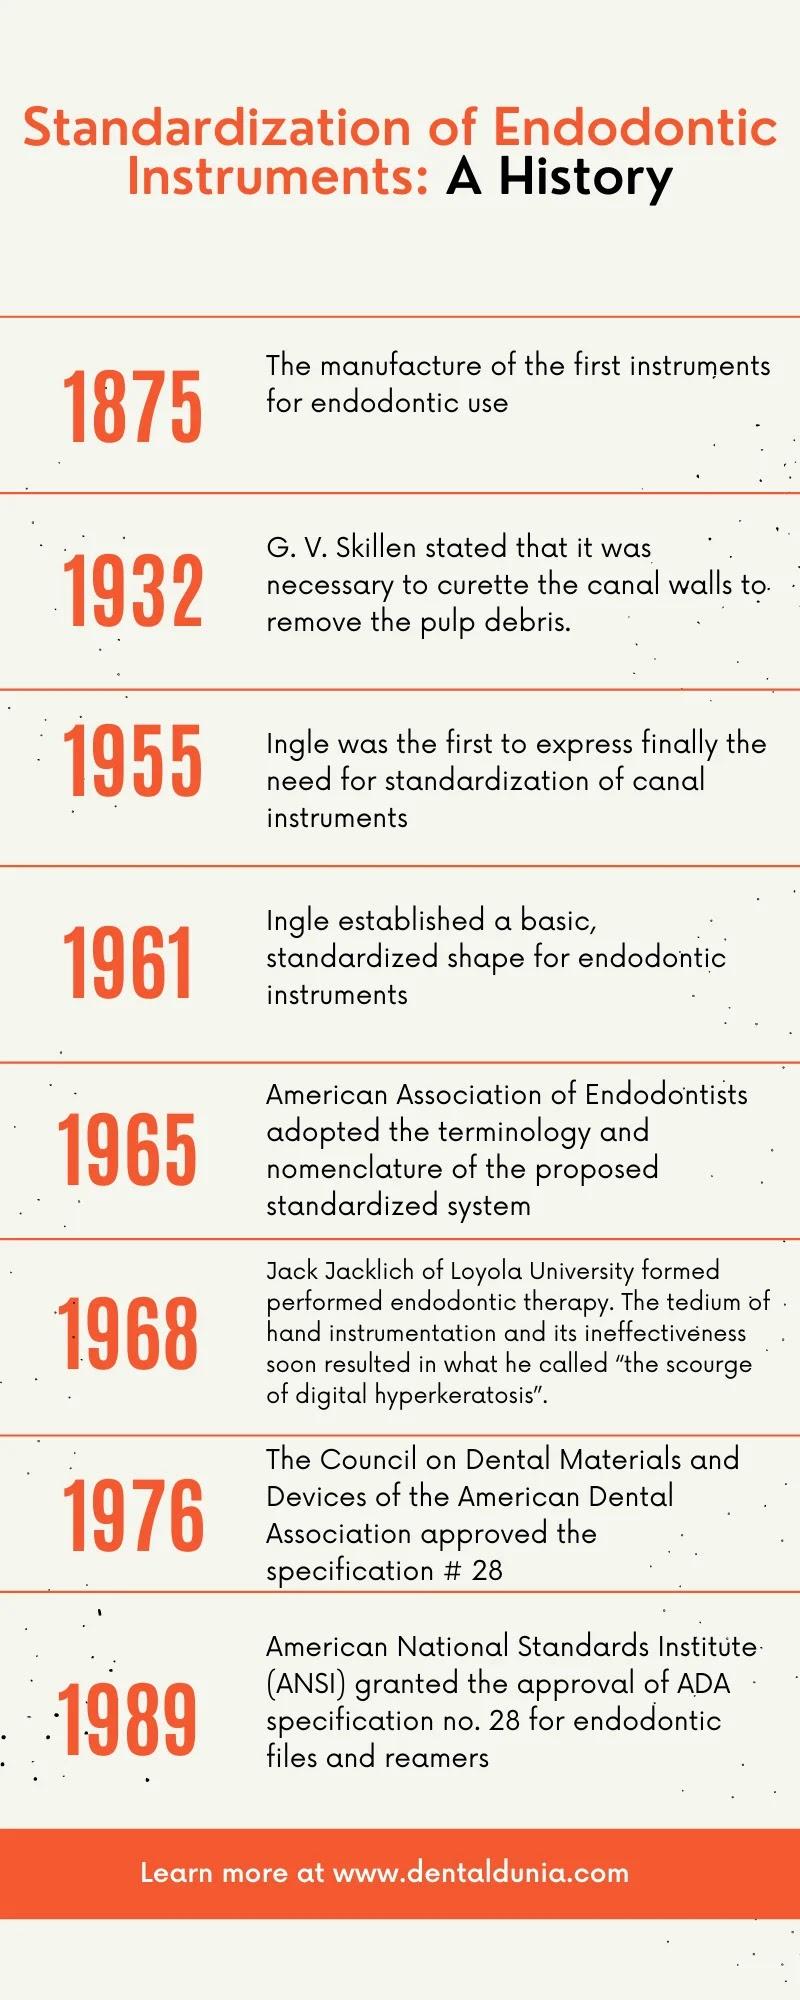 History Standardization of Endodontic Instruments